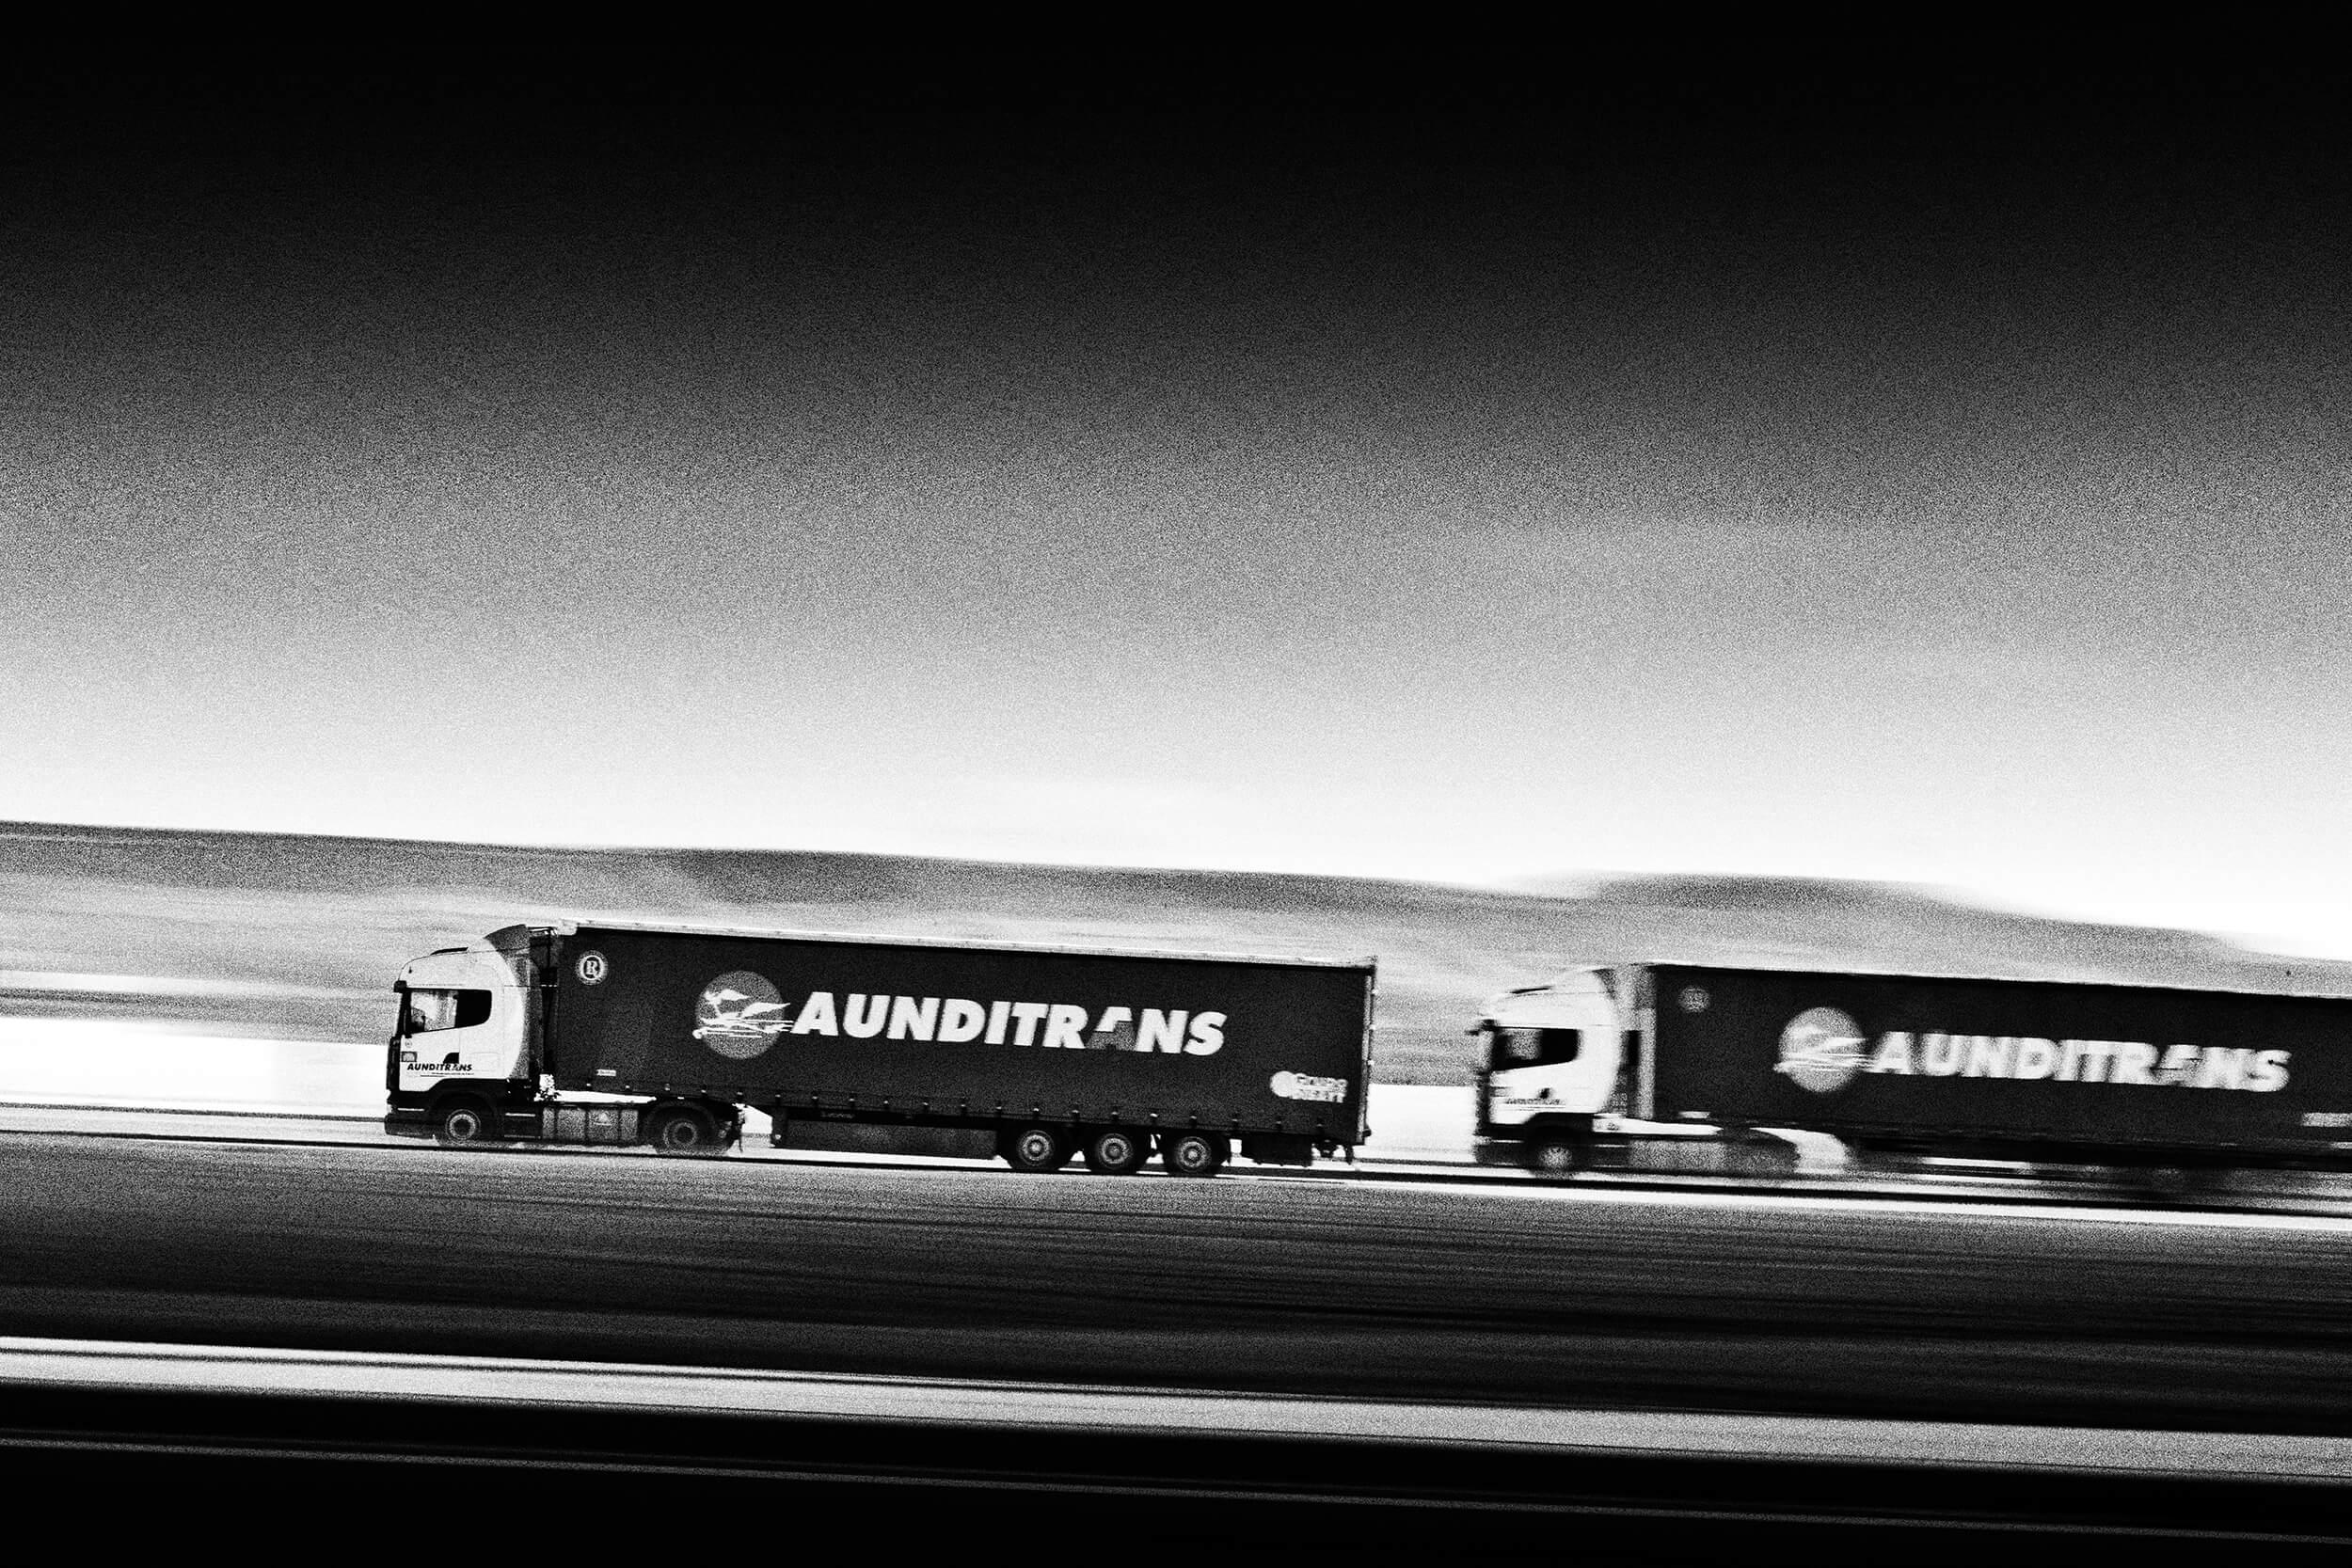 Transport & Logistics Photography by Mikel Muruzabal Studio